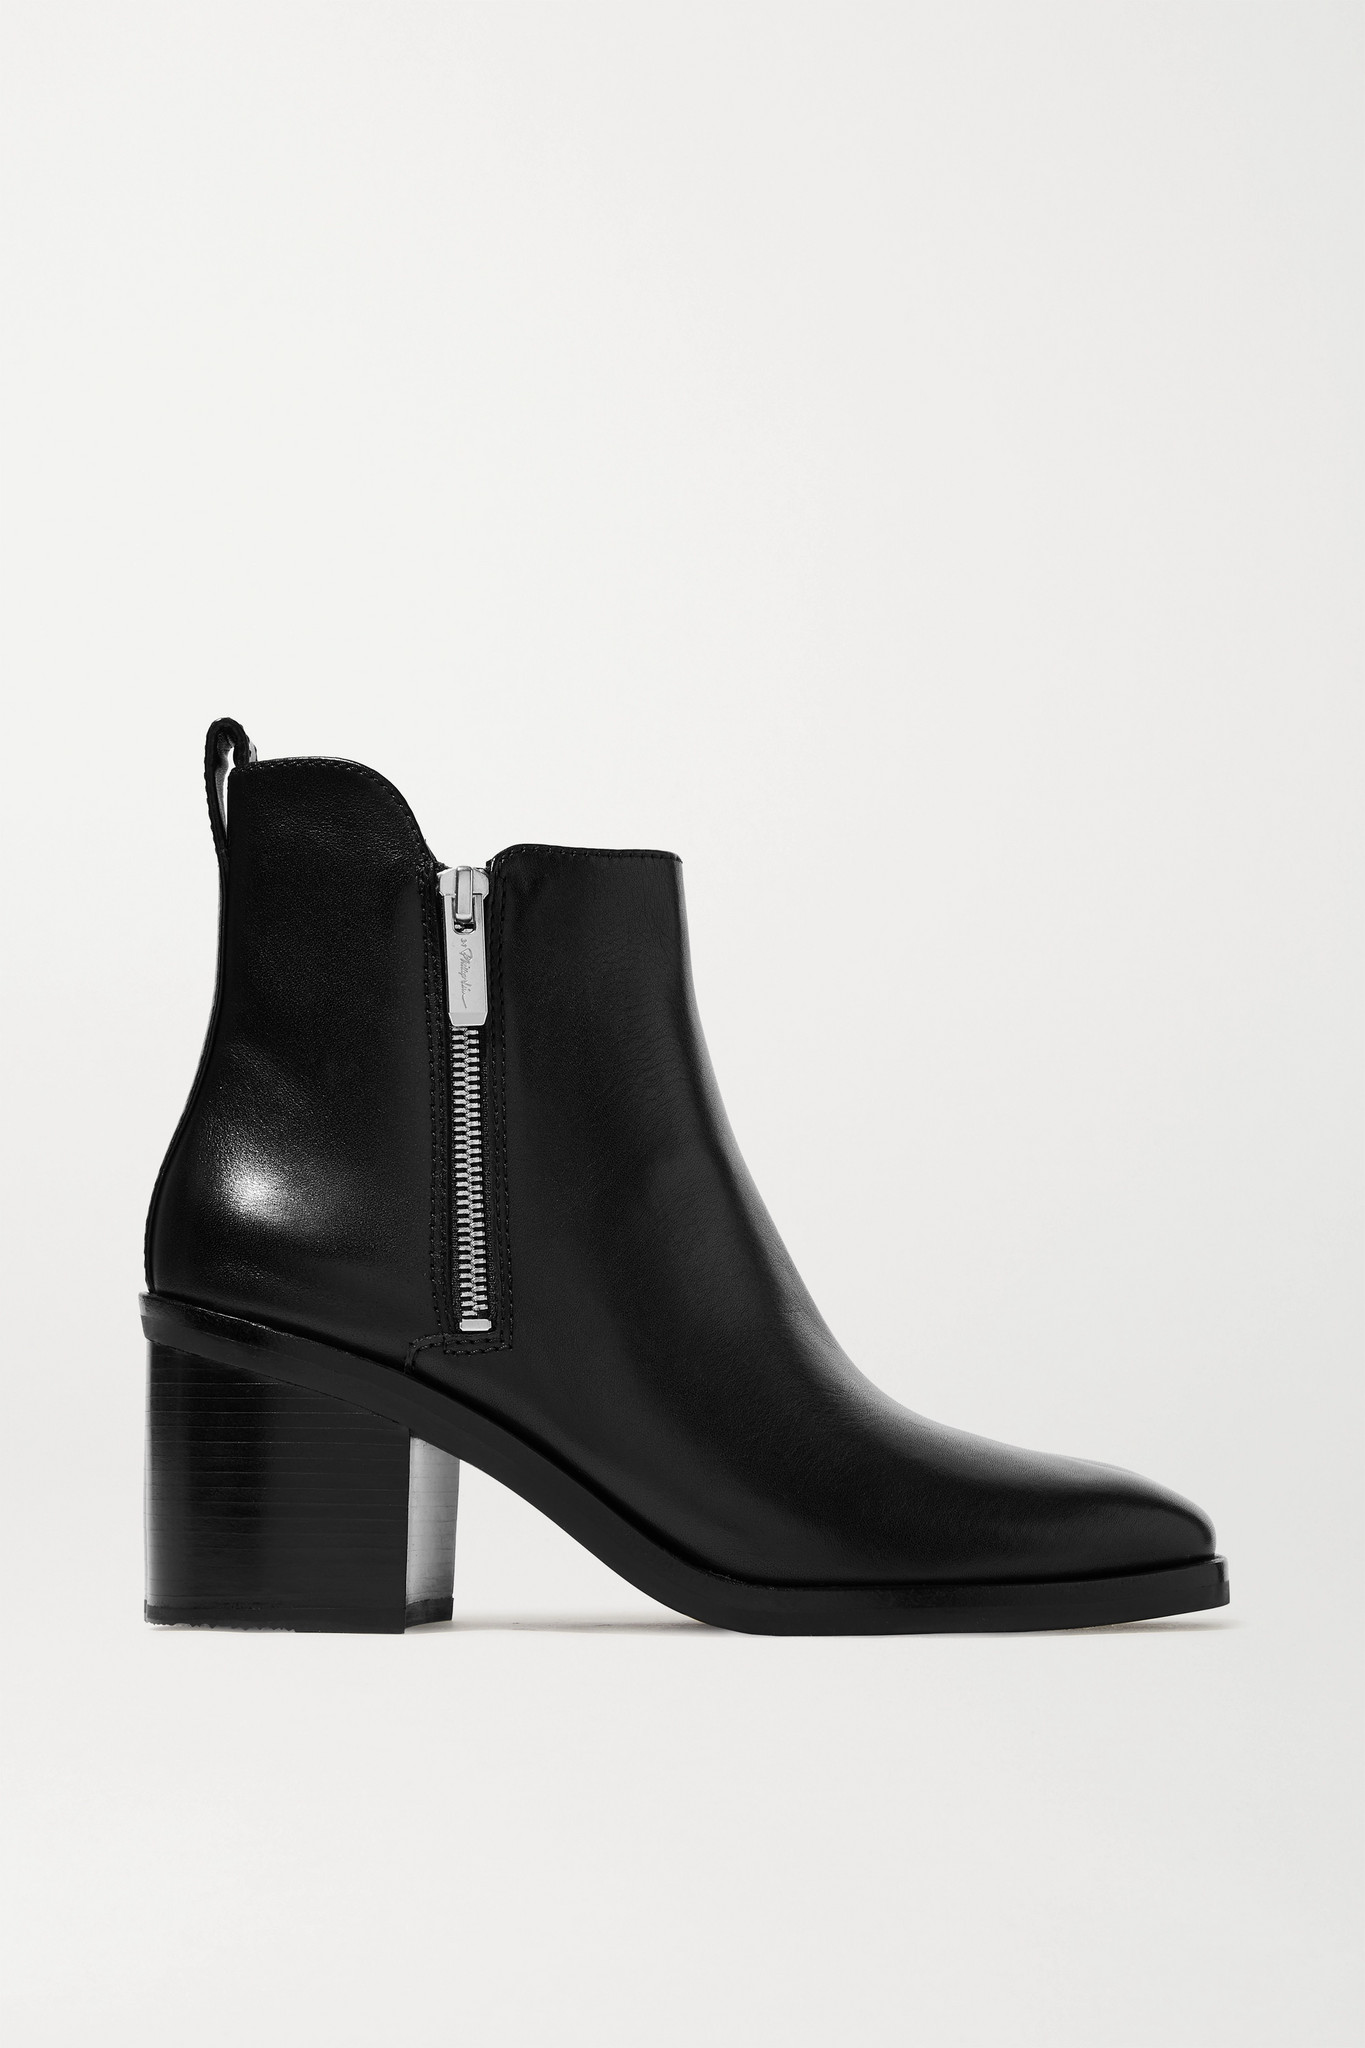 3.1 PHILLIP LIM - Alexa 皮革踝靴 - 黑色 - IT41